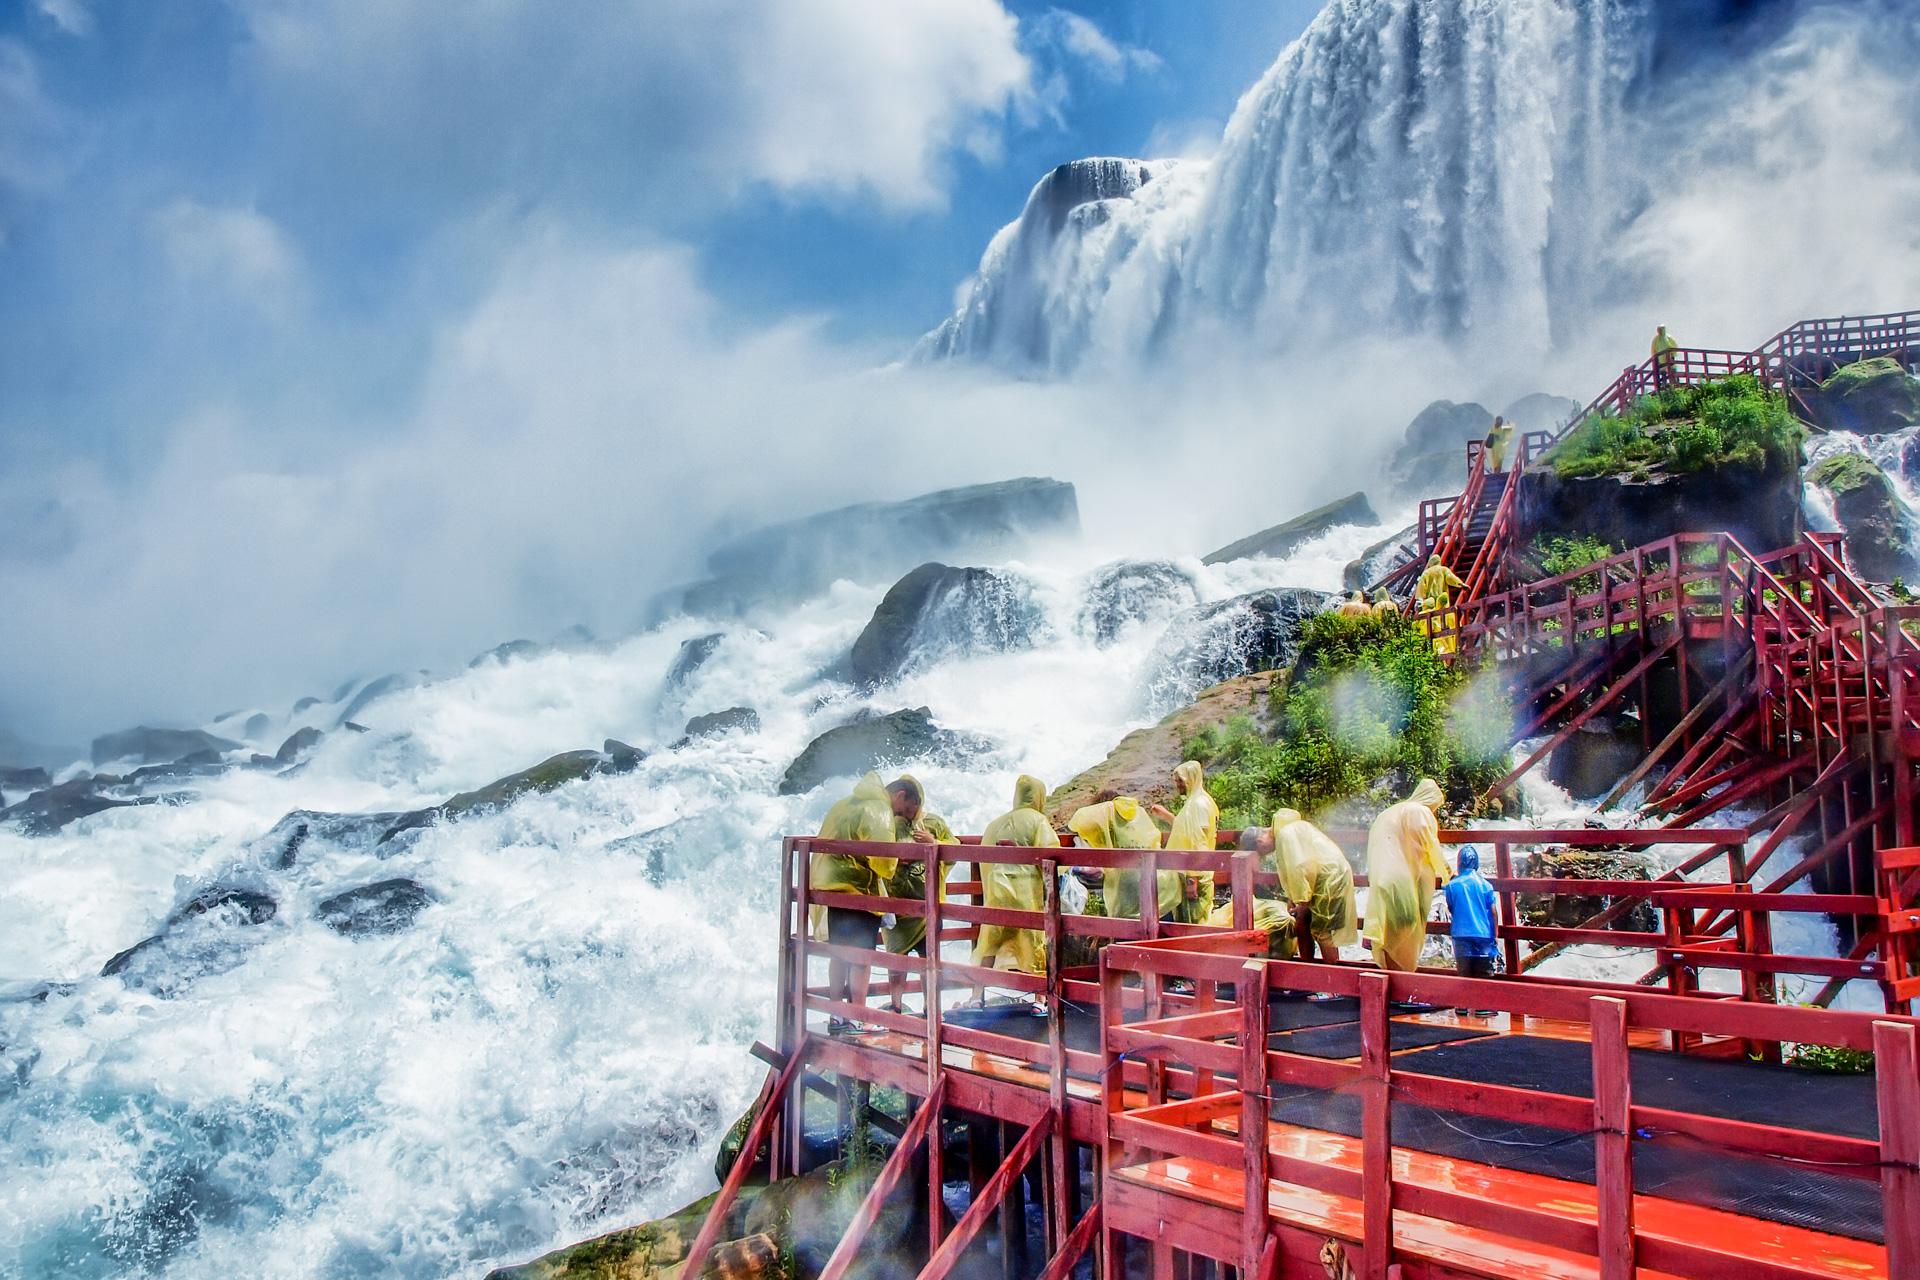 Niagara Falls; Courtesy of Lidiia Kozhevnikova/Shutterstock.com